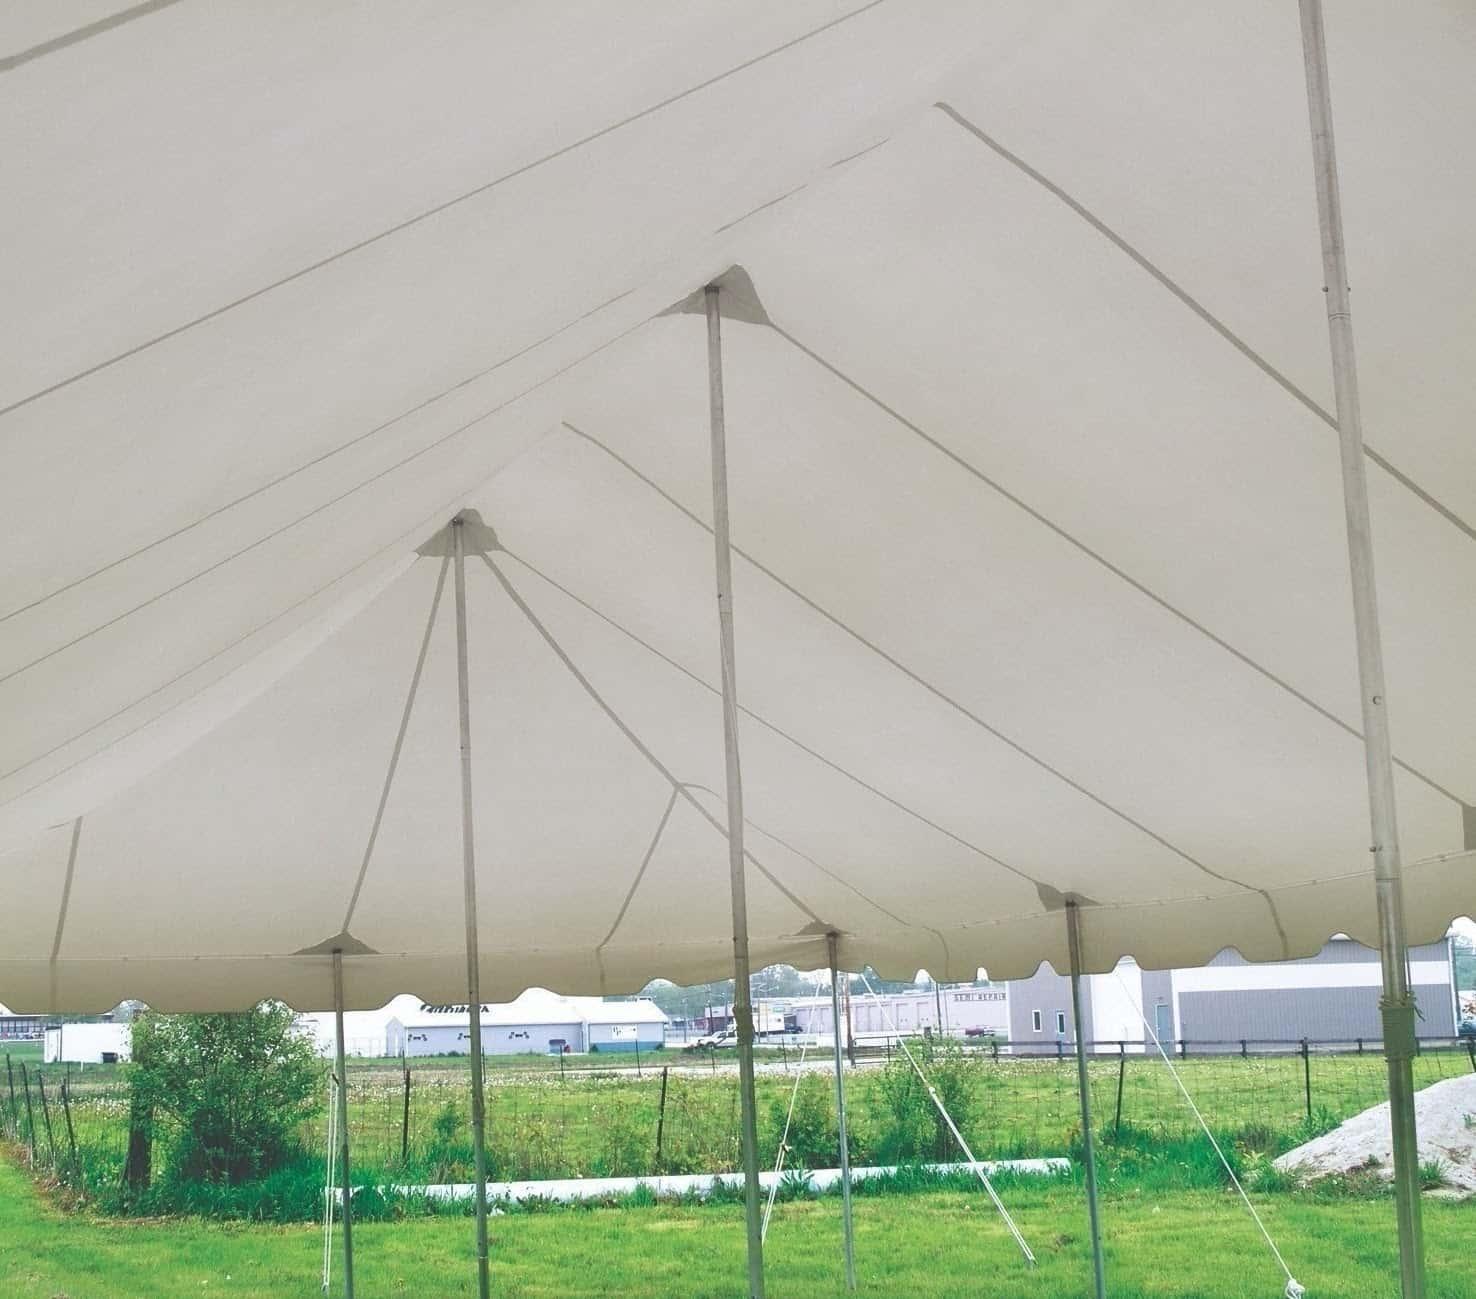 under_canopy-min.jpg